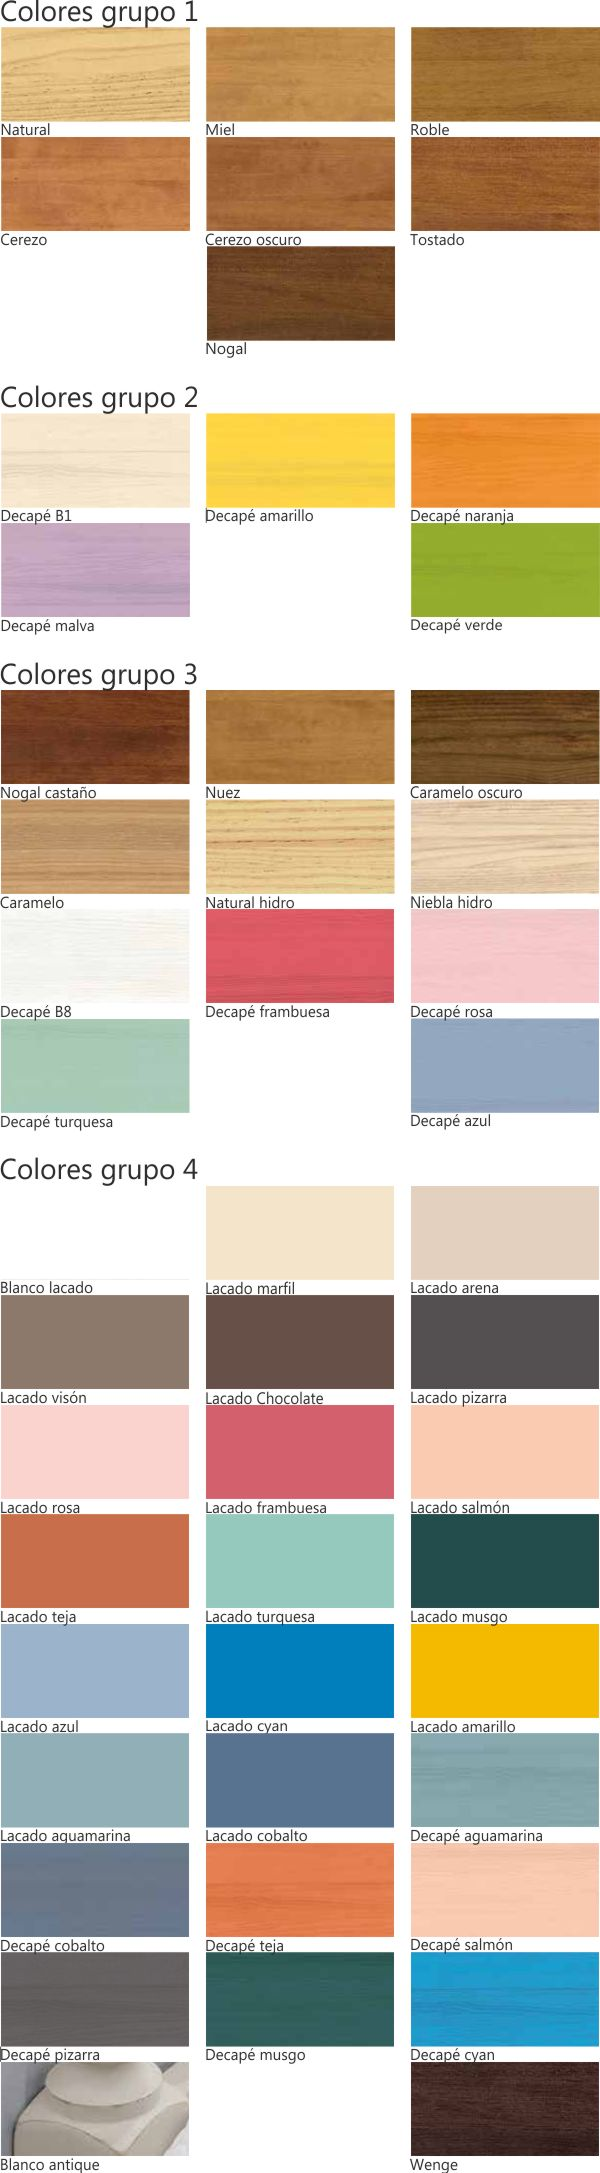 Colores%20Jose%20ibanez%202020.jpg